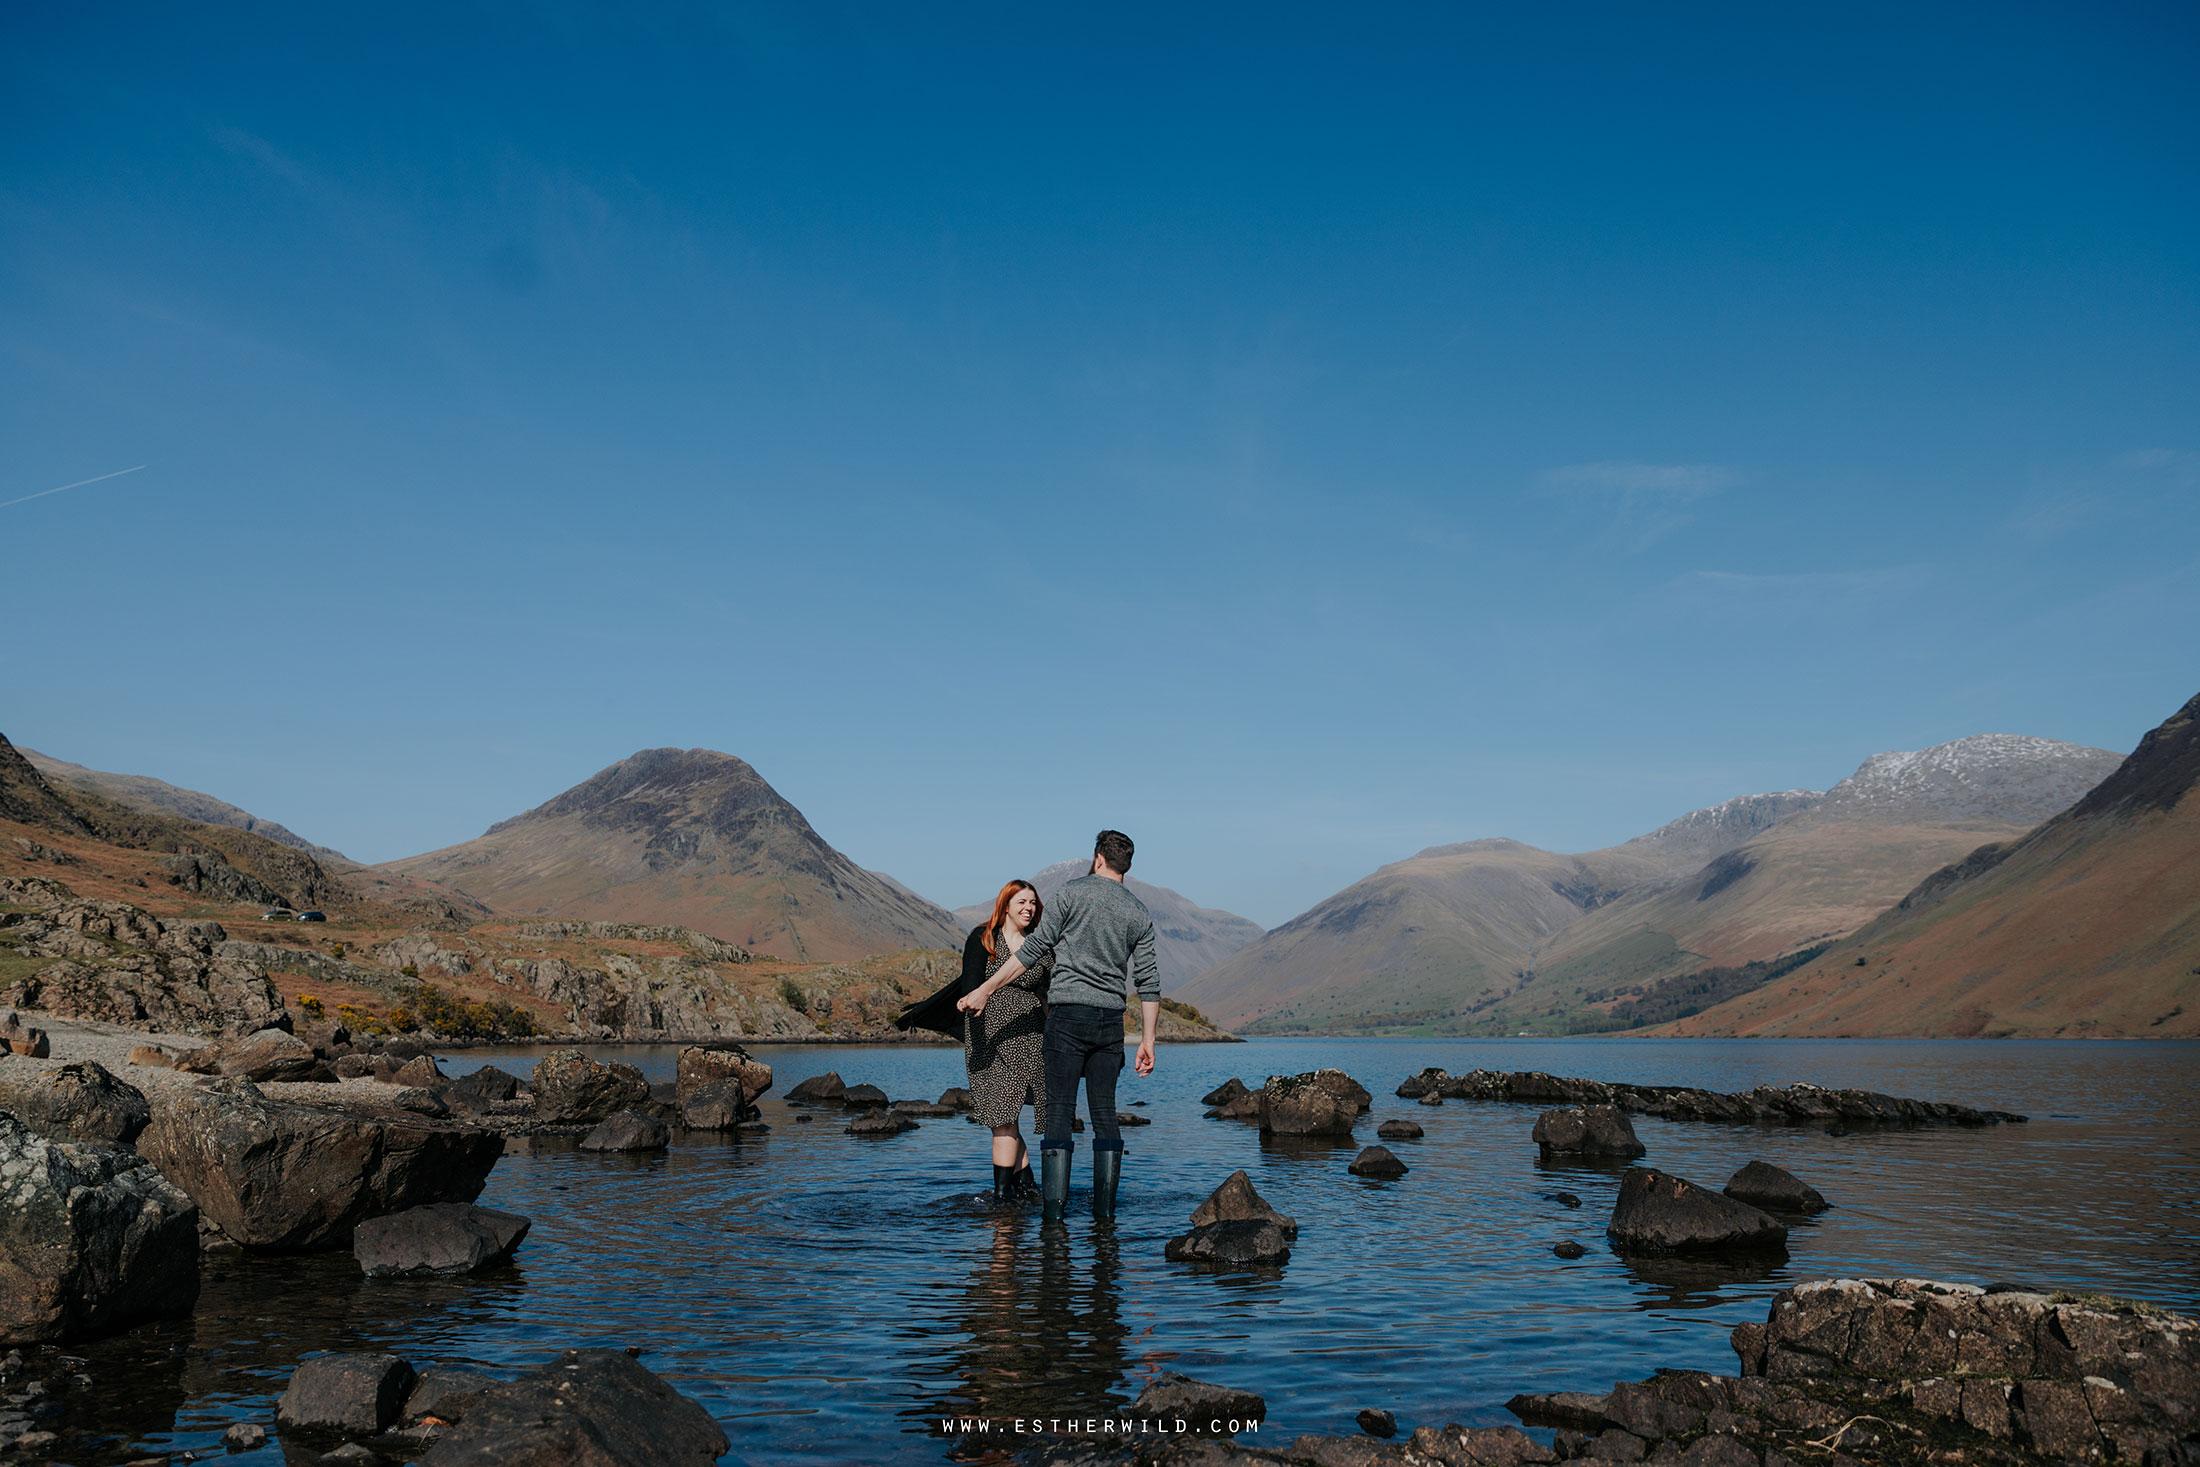 Cumbria_Lake_District_Wasdale_Wedding_Photographer_Destination_Engagement_Anniversary_Esther_Wild_IMG_3327.jpg